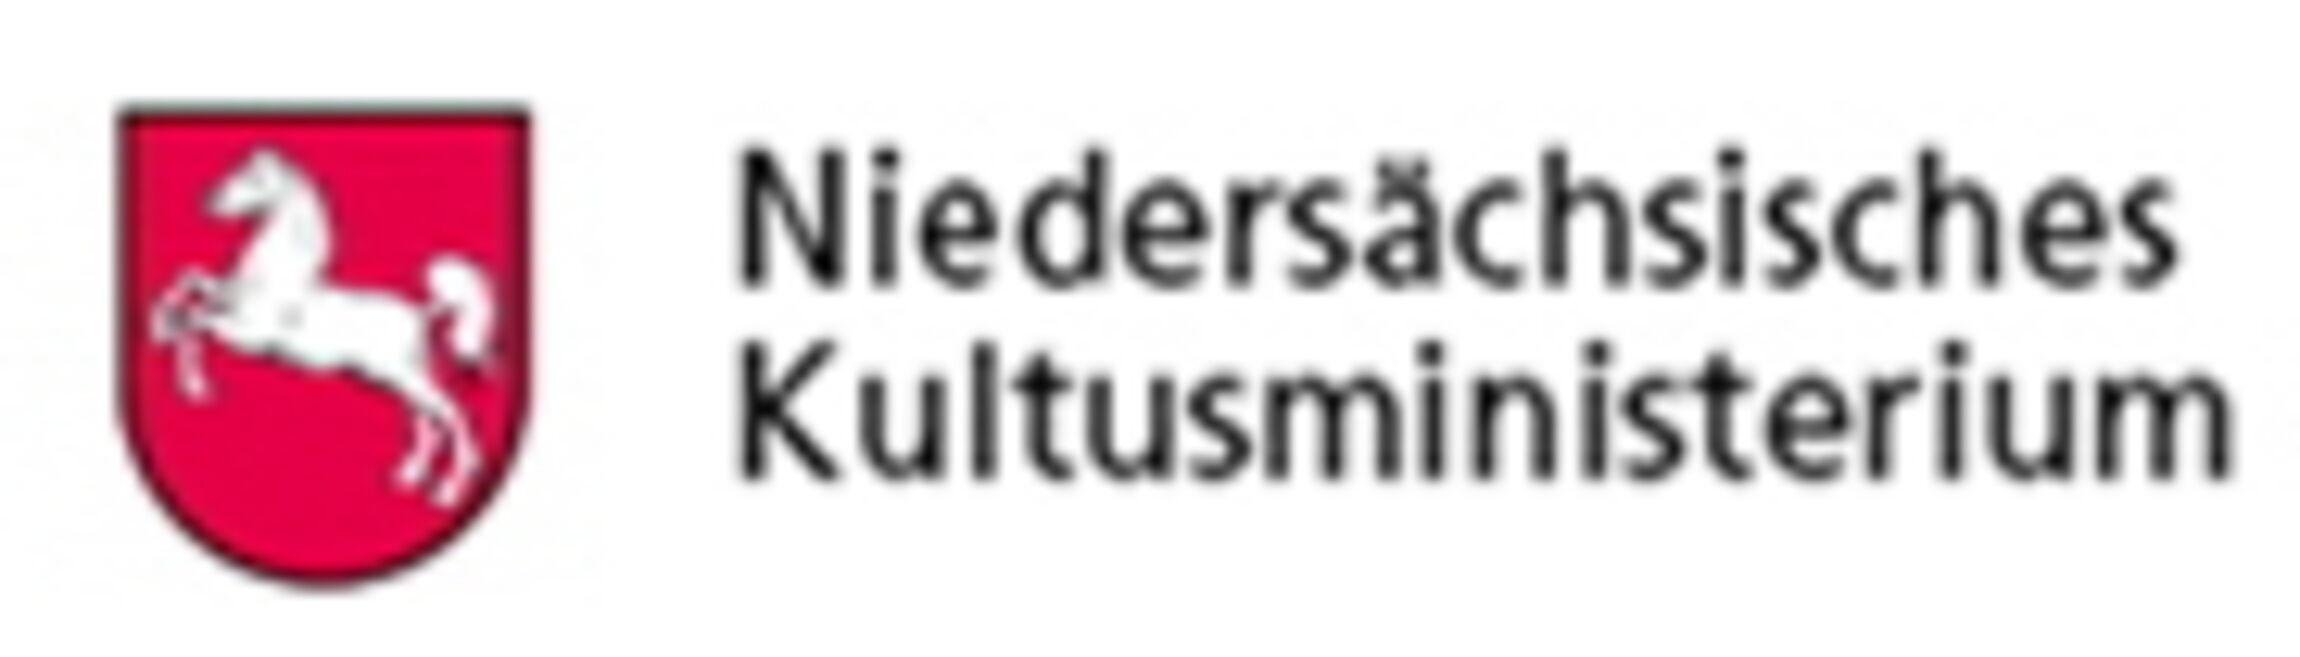 KM - Nds Kultusministerium